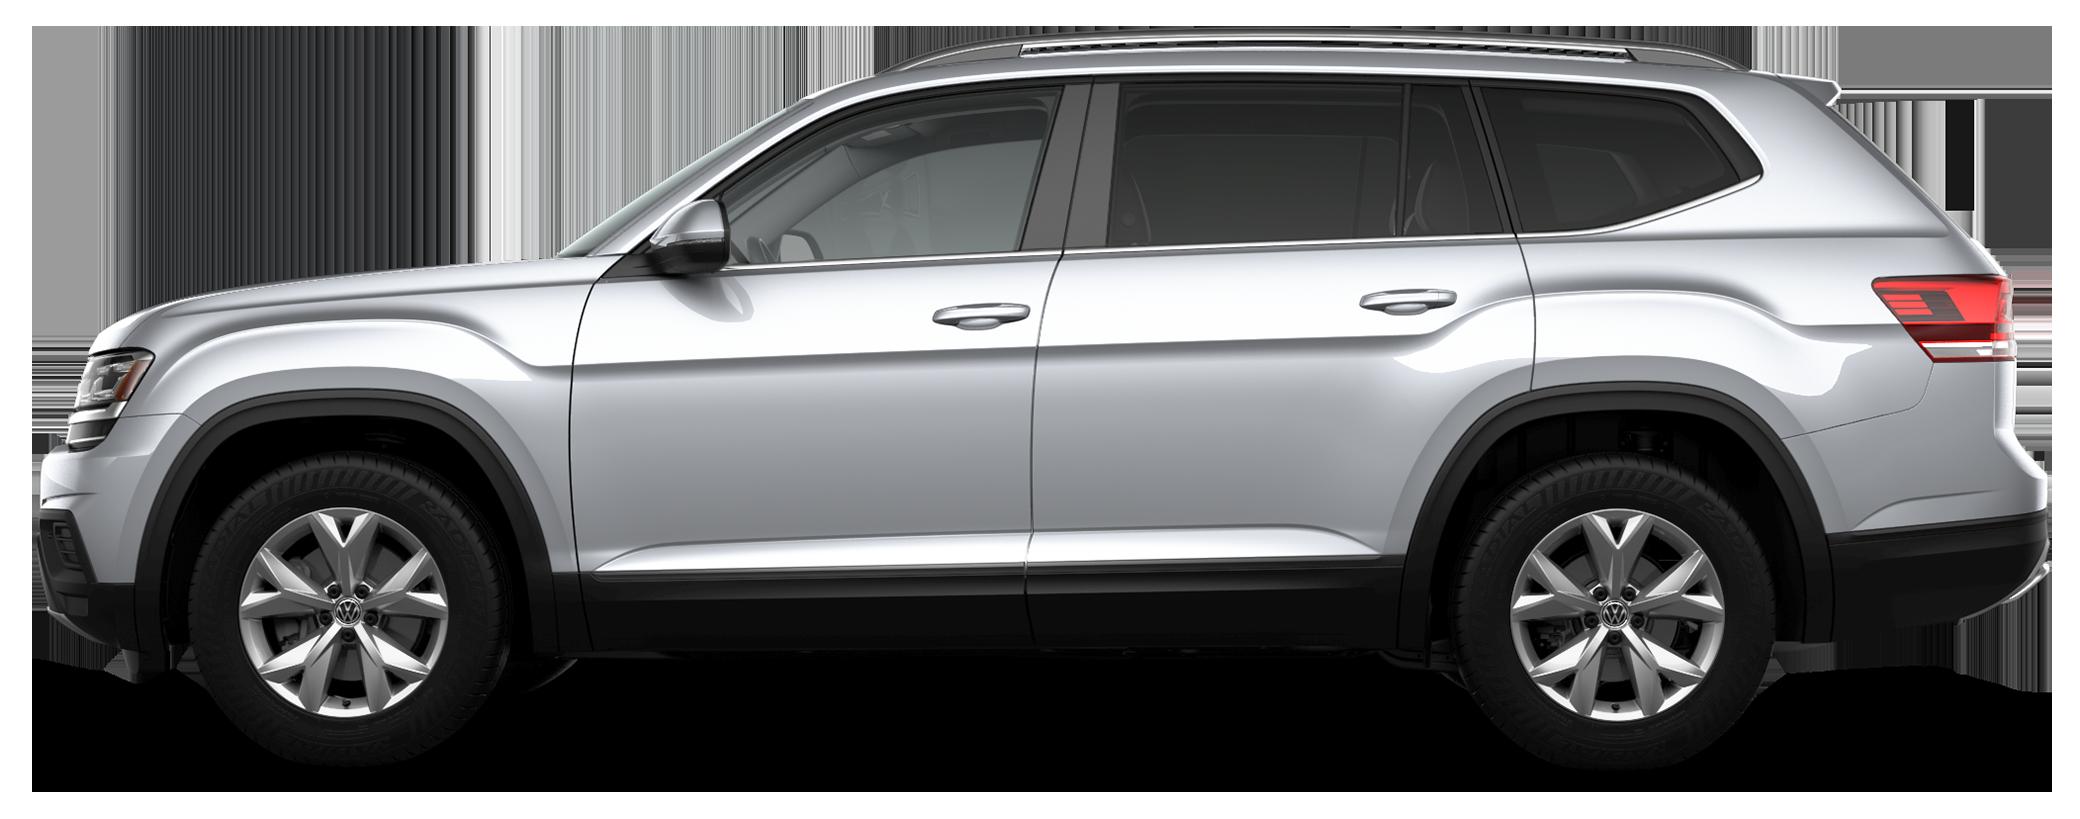 2019 Volkswagen Atlas SUV 2.0T S